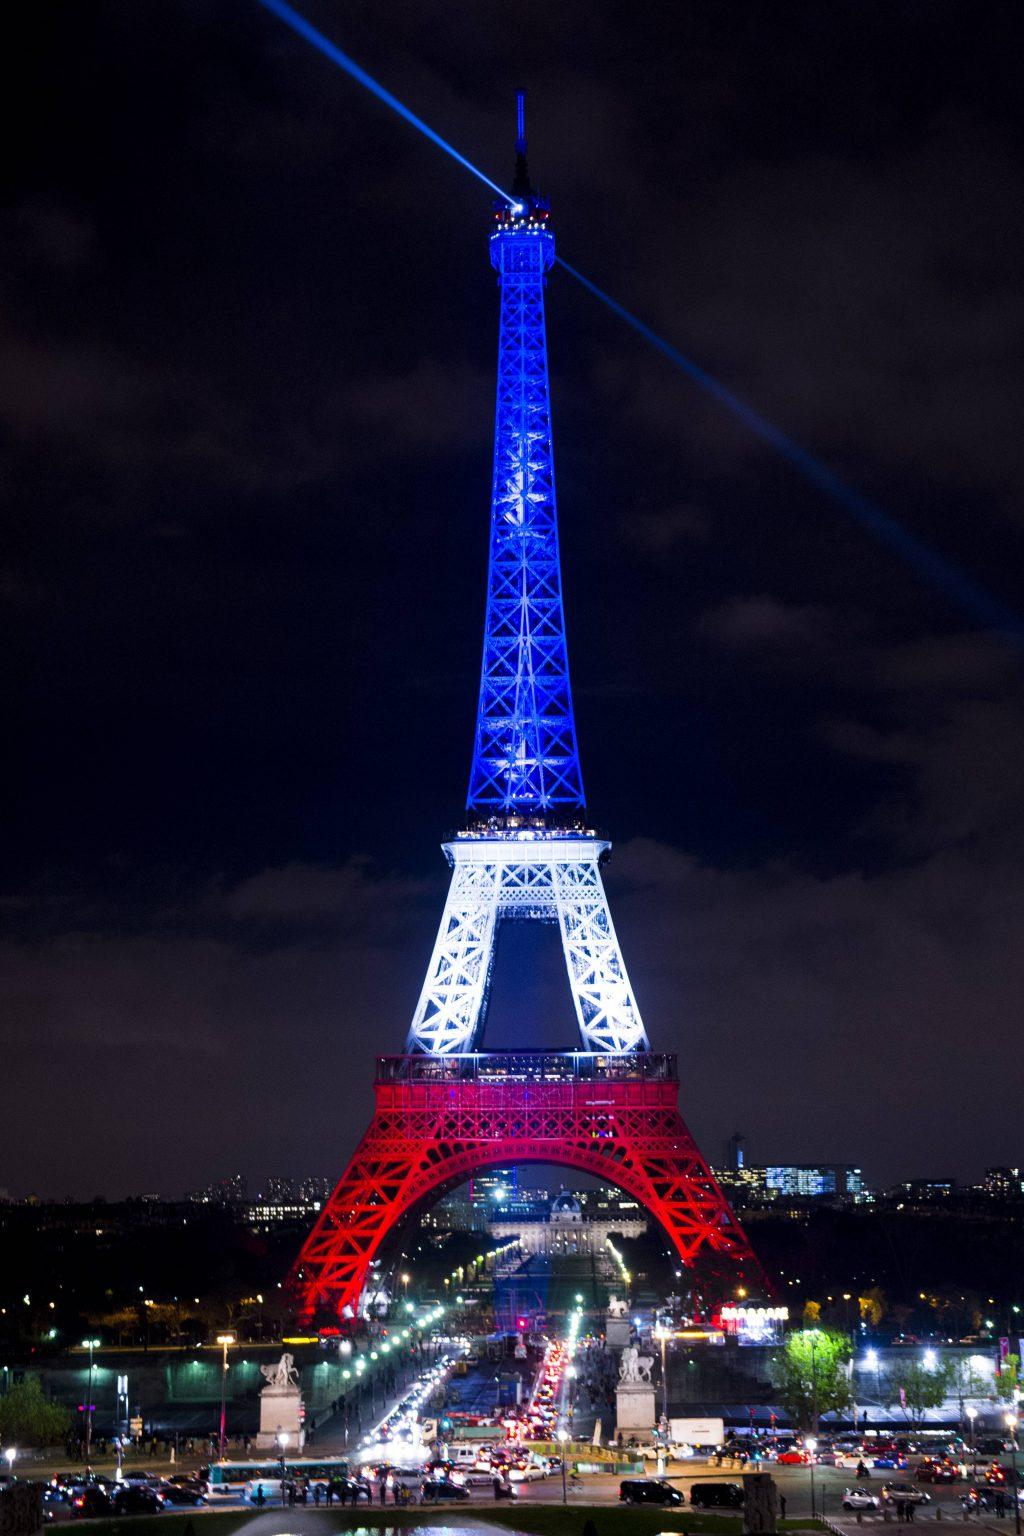 Eiffelturm beleuchtet in den französischen Nationalfarben Blau Weiß Rot  - 16/11/2015 JBAutissier/Panoramic PUBLICATIONxNOTxINxFRAxITAxBELEiffel Tower illuminated in the French National colours Blue white Red 16 11 2015 JBAutissier Panoramic PUBLICATIONxNOTxINxFRAxITAxBEL